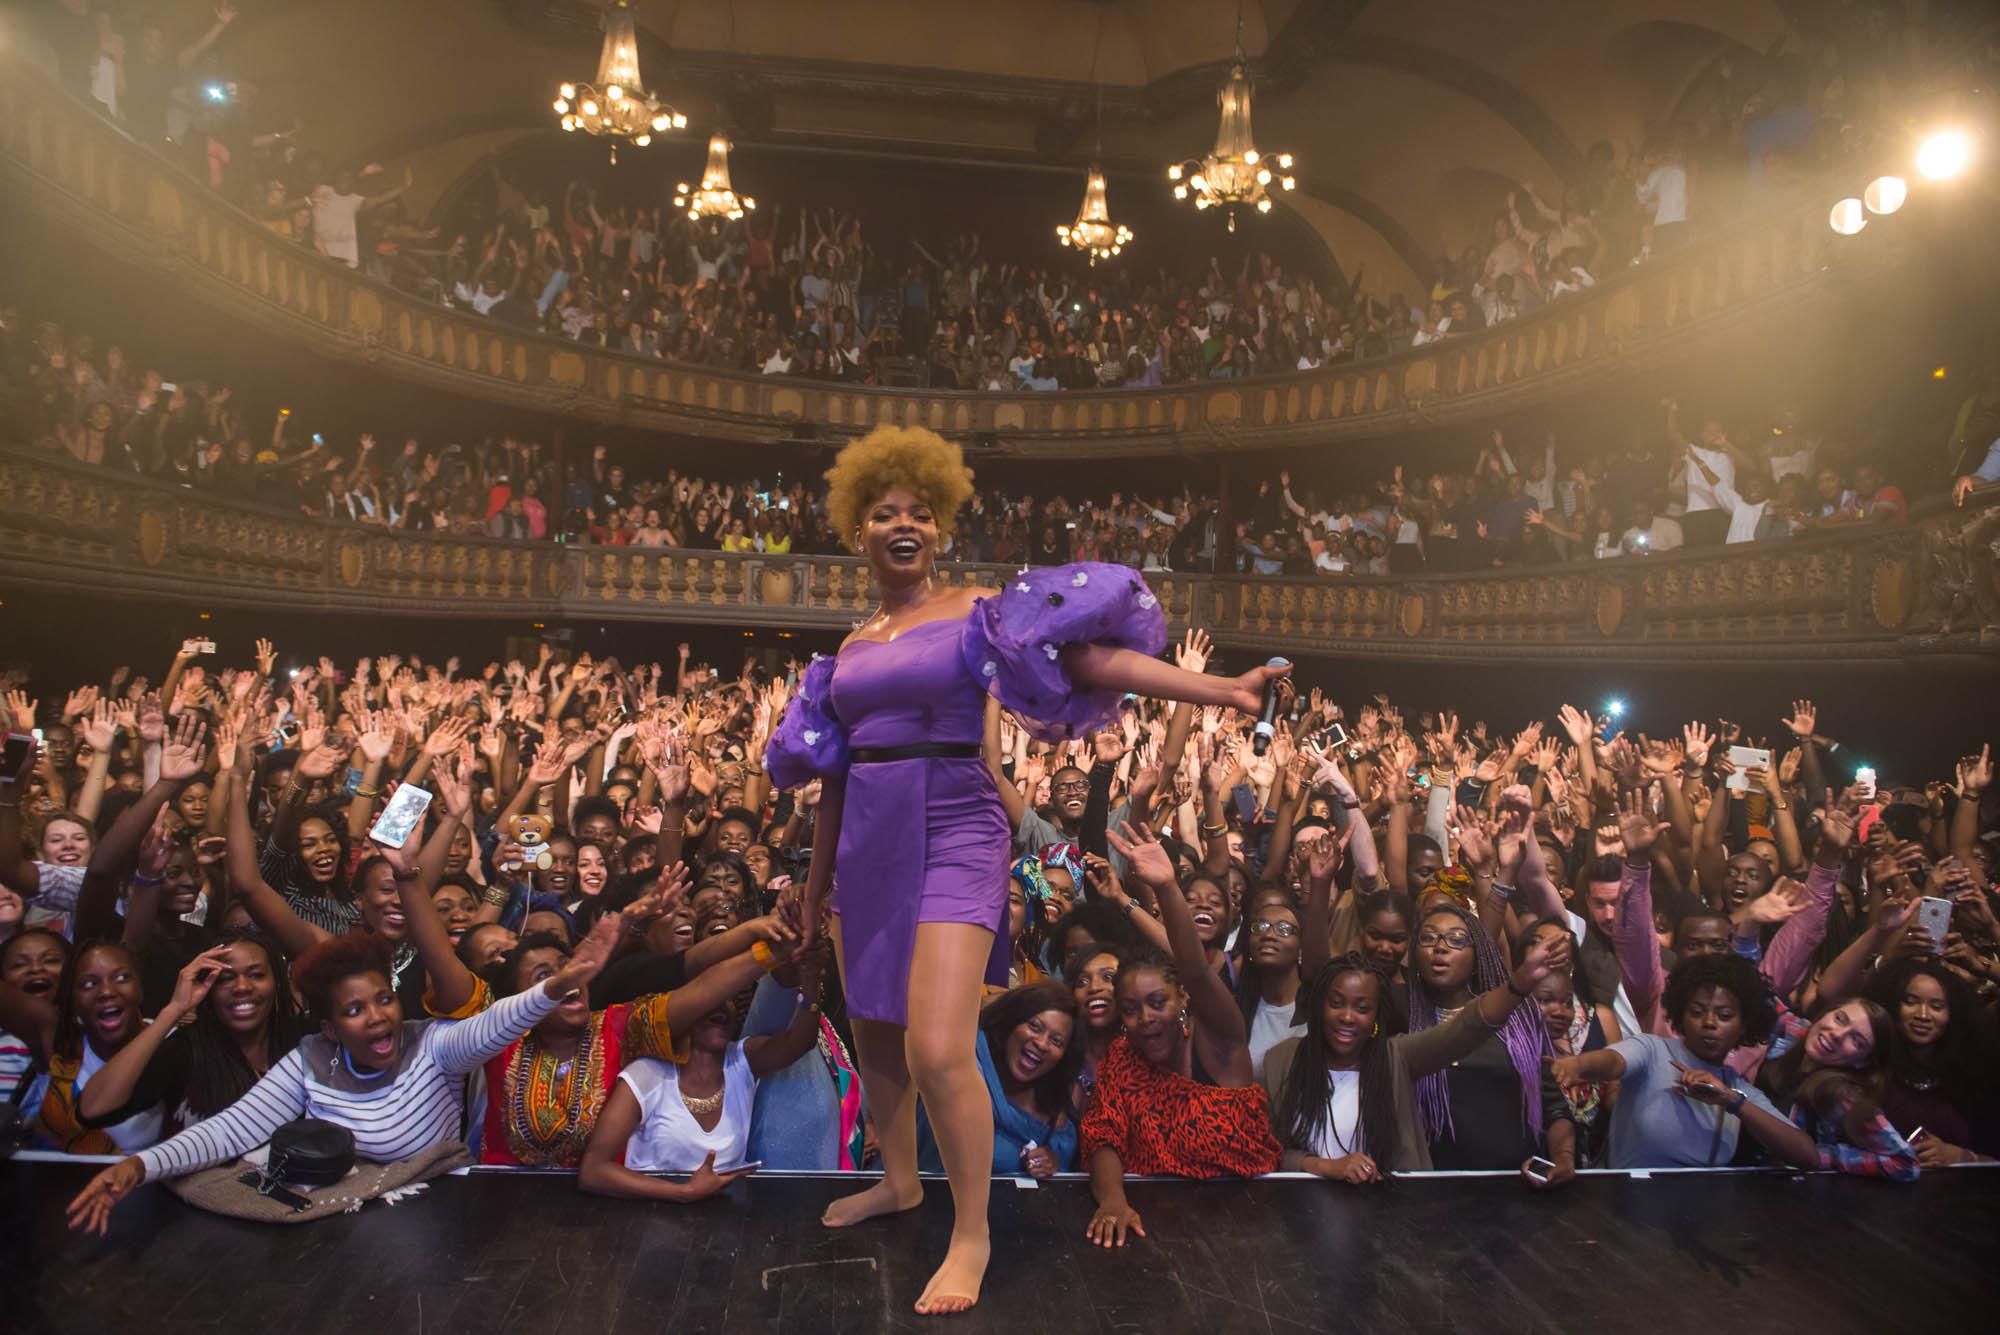 Paris, France. 7th April 2017. Yemi Alade performs at Le Trianon, Paris. Photographed by Michael Tubes